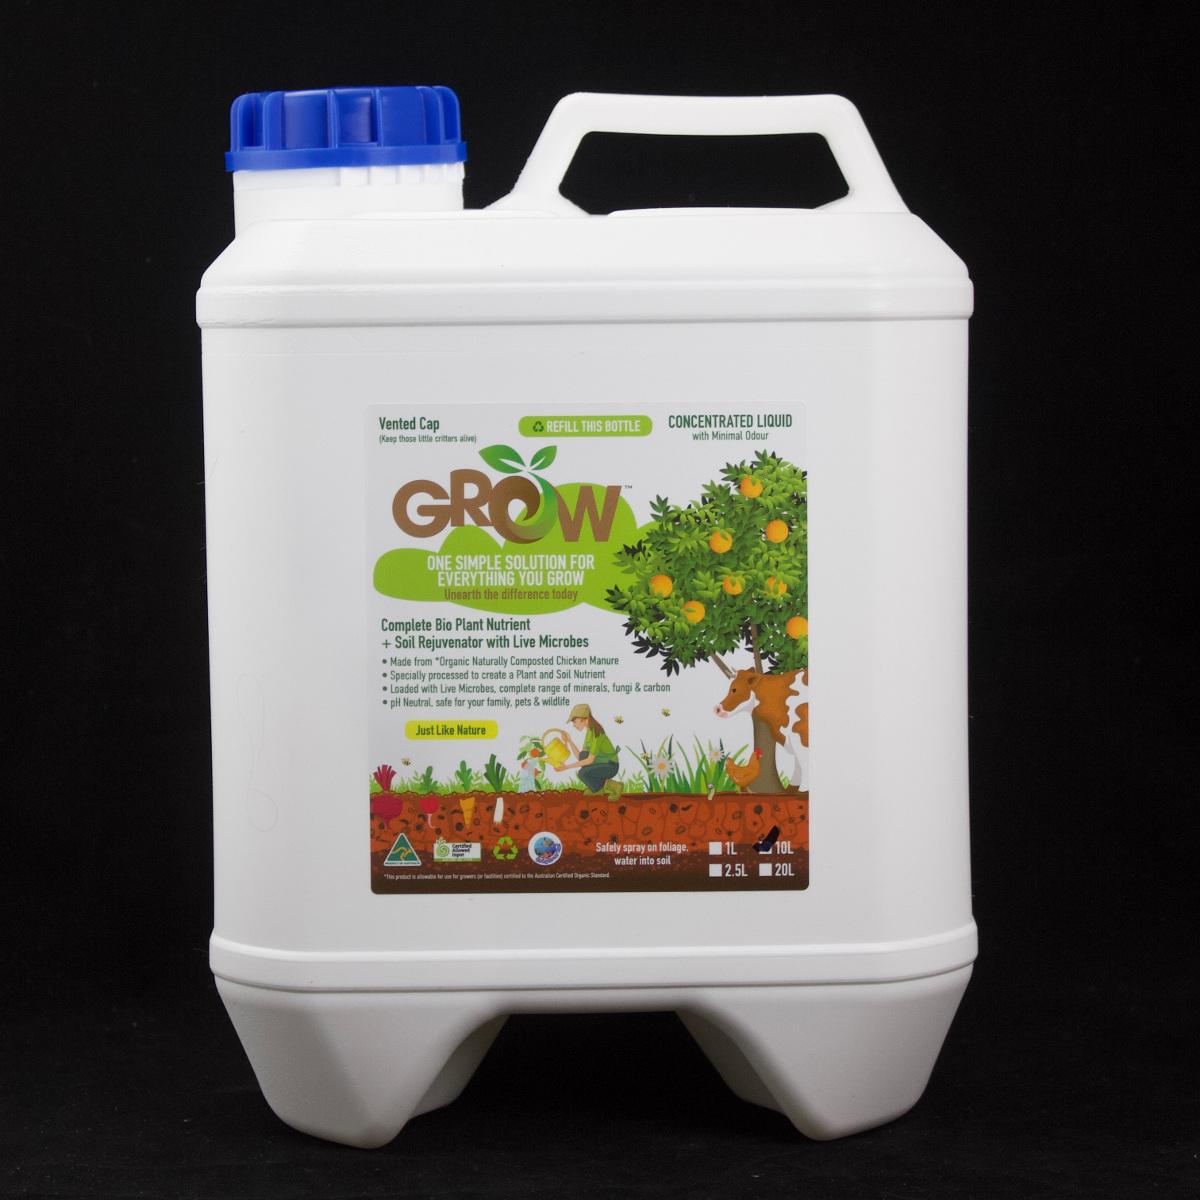 GROW 10 litre